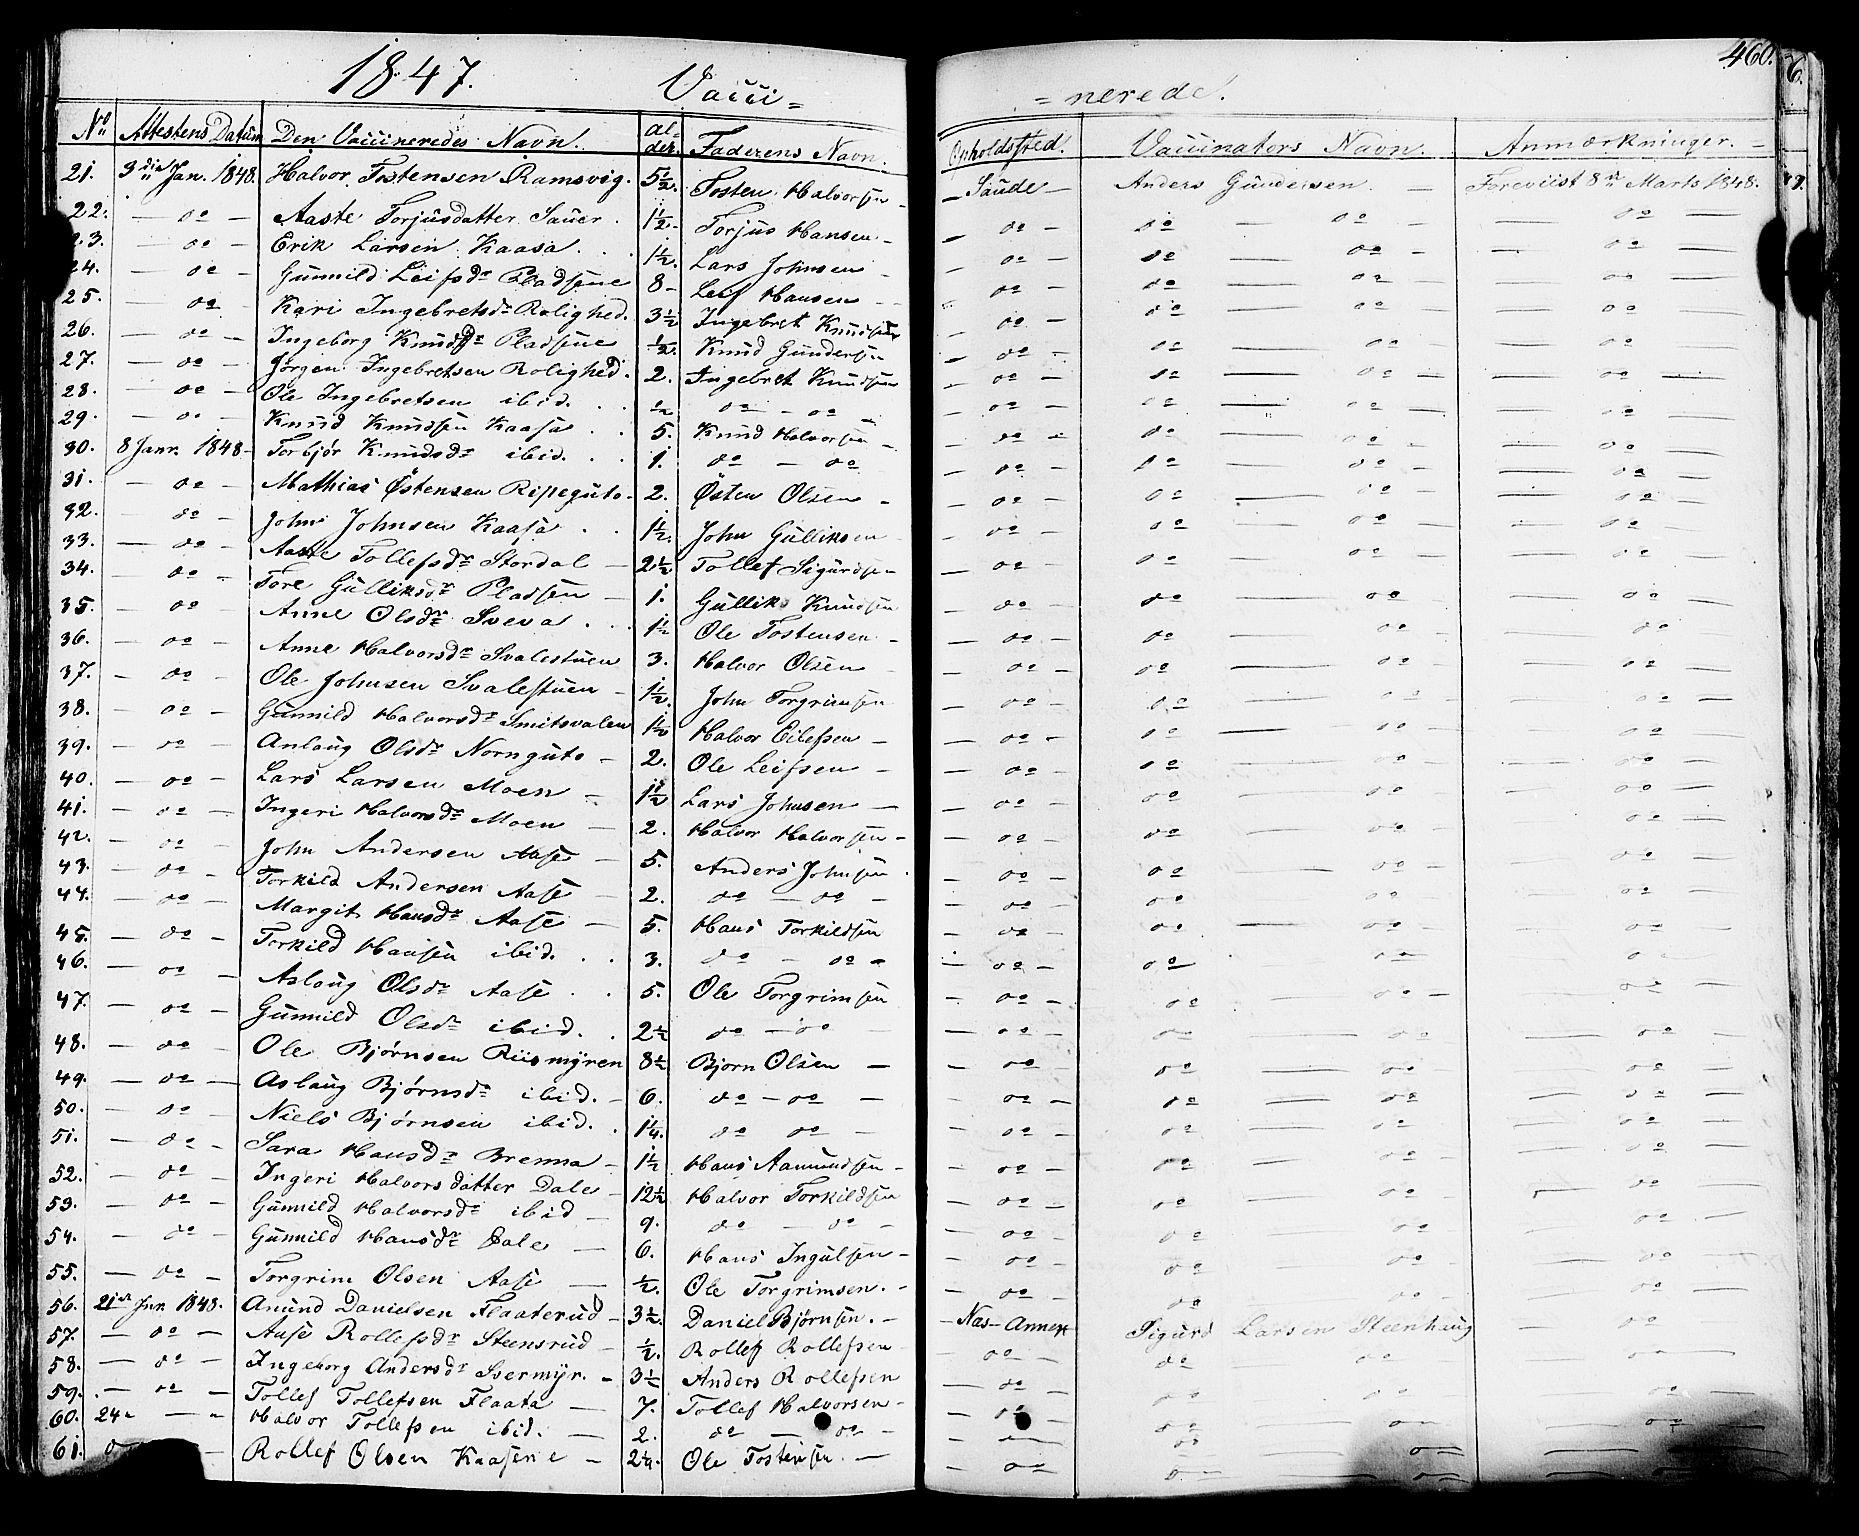 SAKO, Sauherad kirkebøker, F/Fa/L0006: Ministerialbok nr. I 6, 1827-1850, s. 460